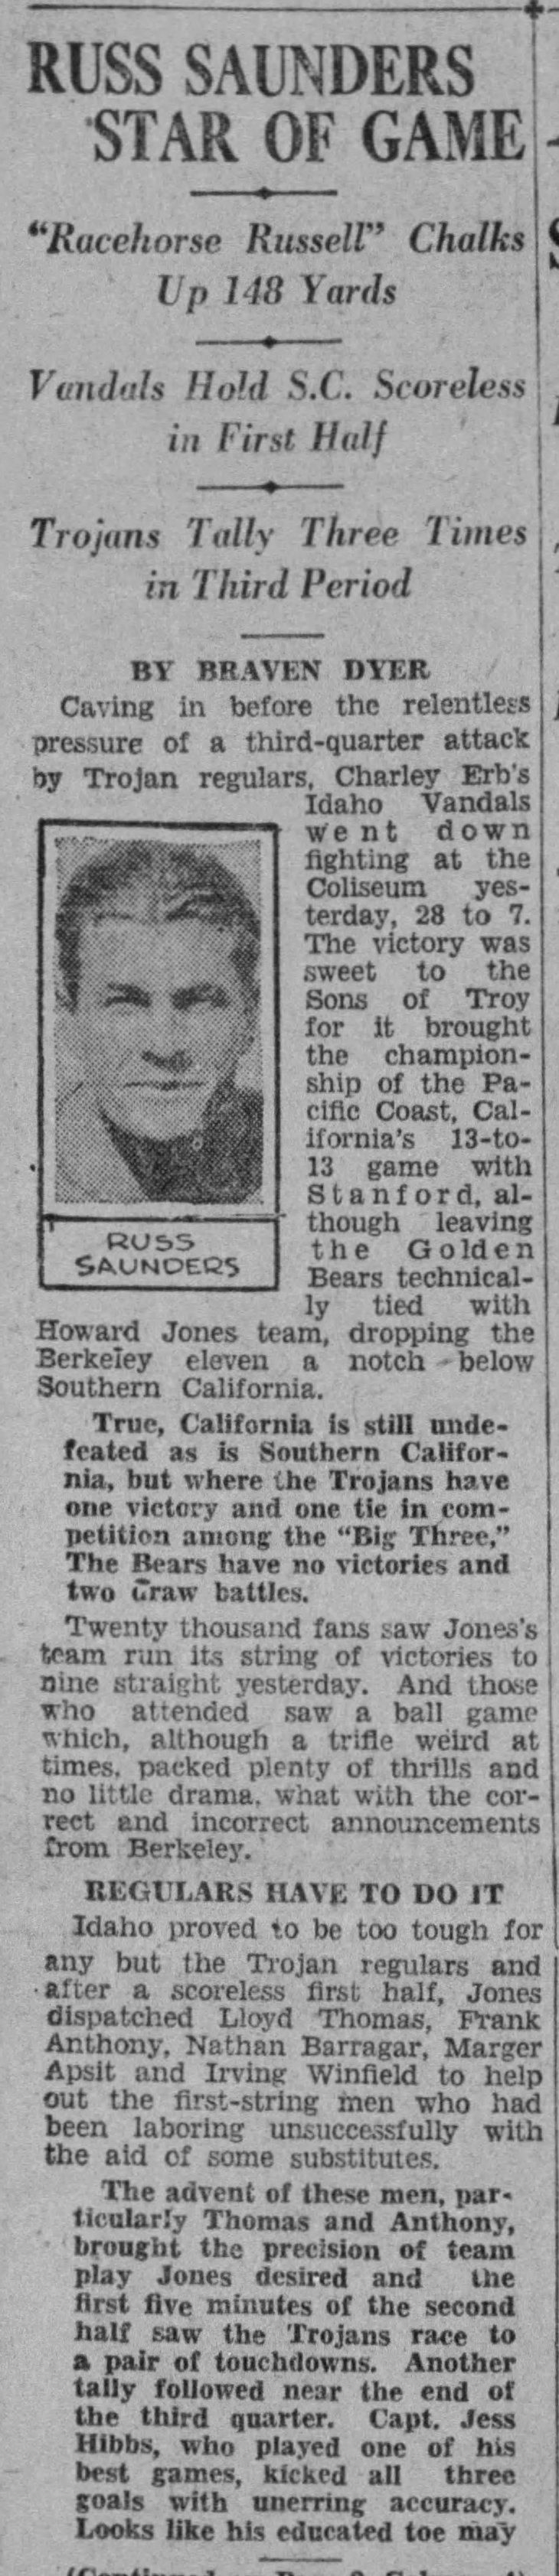 The_Los_Angeles_Times_Sun__Nov_25__1928_ (3)